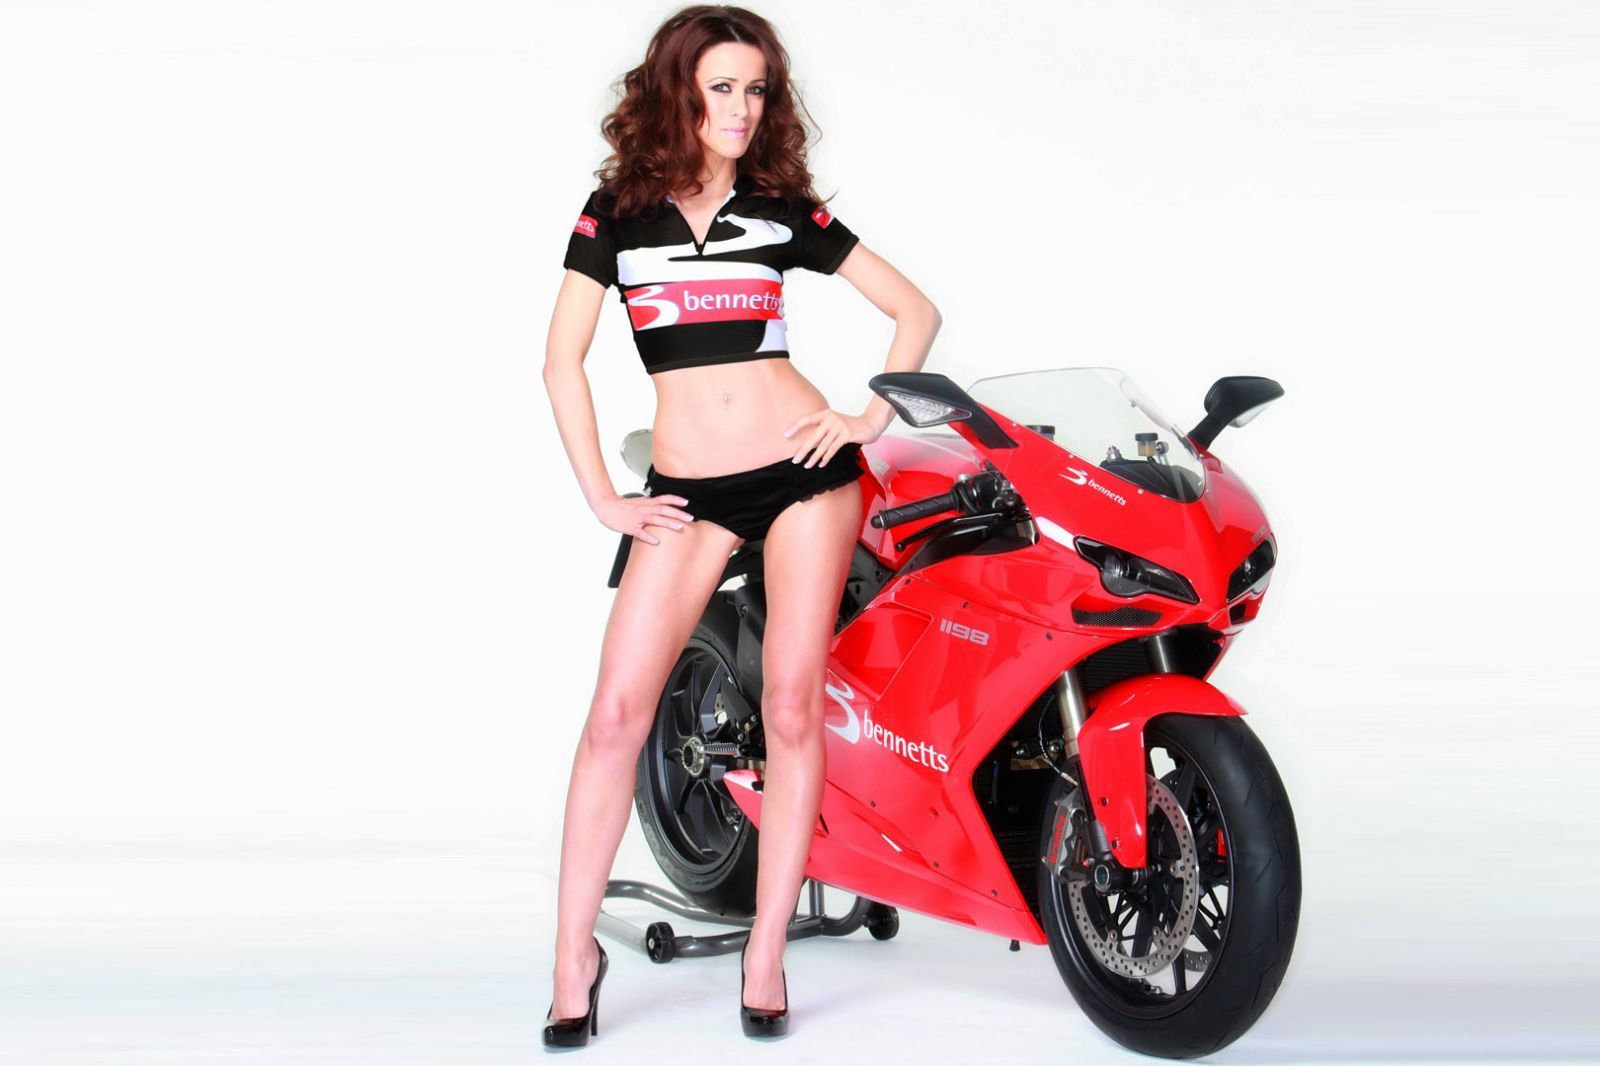 Infos avis moto occasion motos d 39 occasion - Concessionnaire moto salon de provence ...